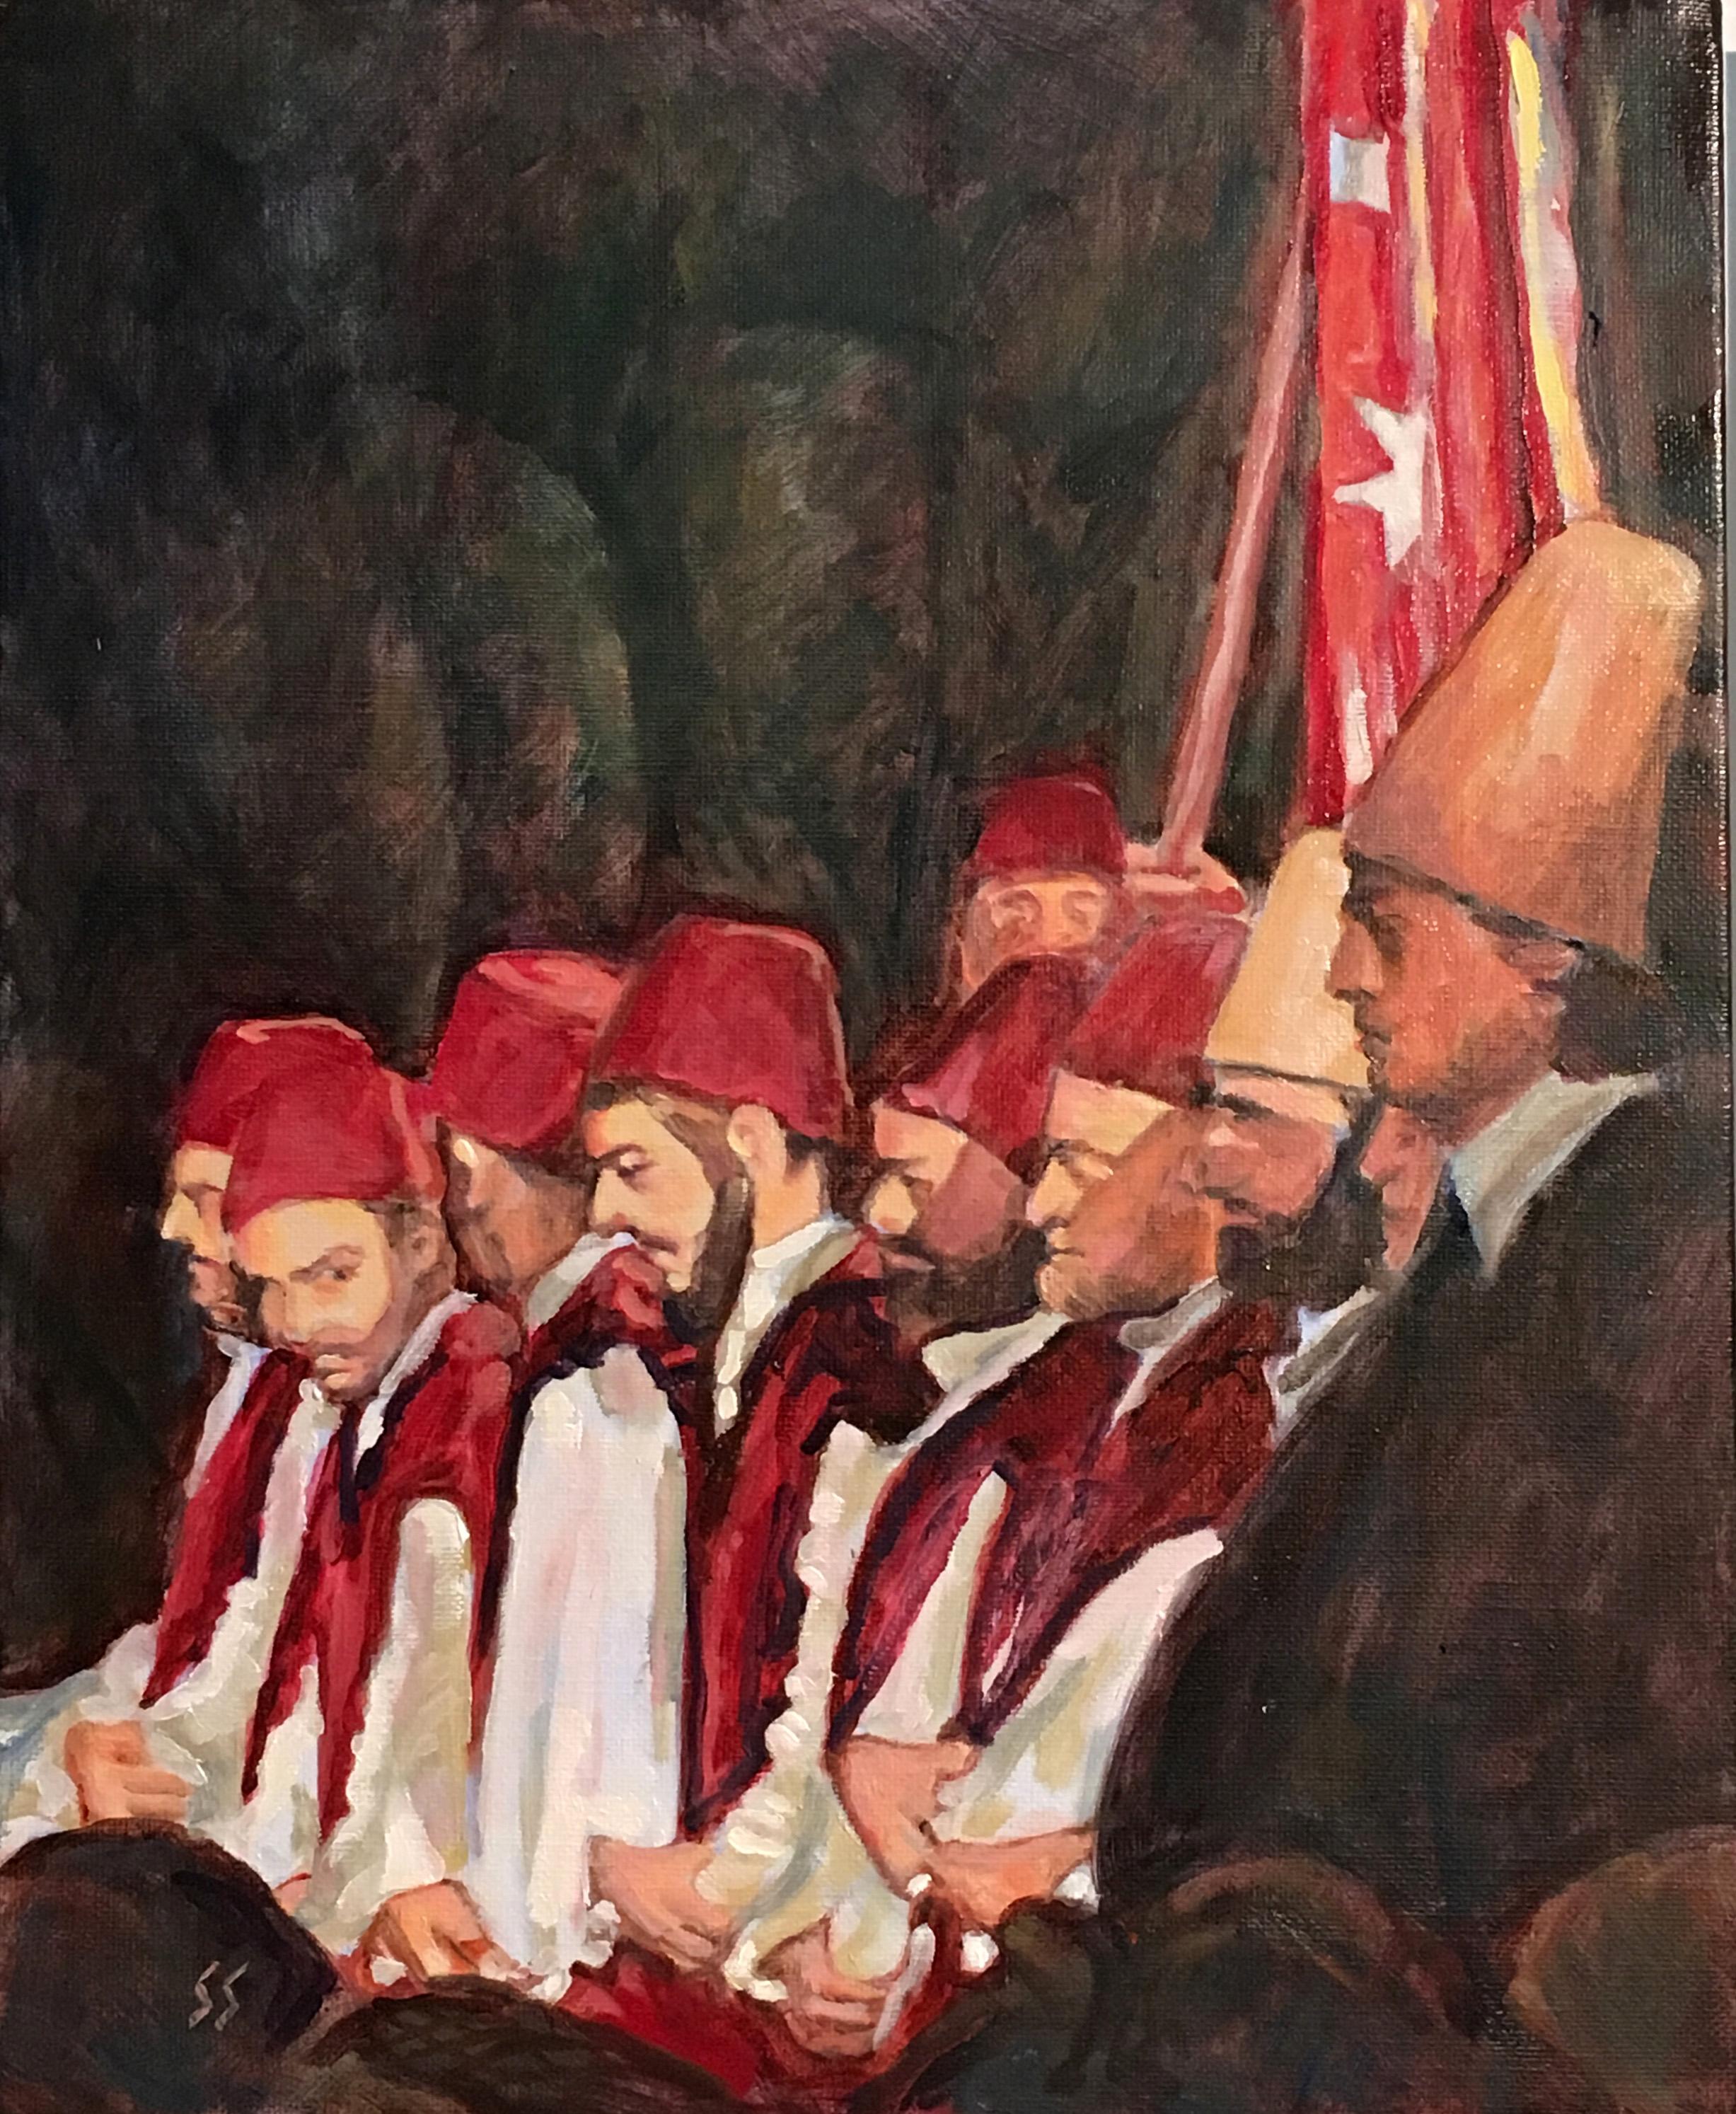 Turkish Sufi Performance, Fes (Fez), Morocco – Susan Mayclin